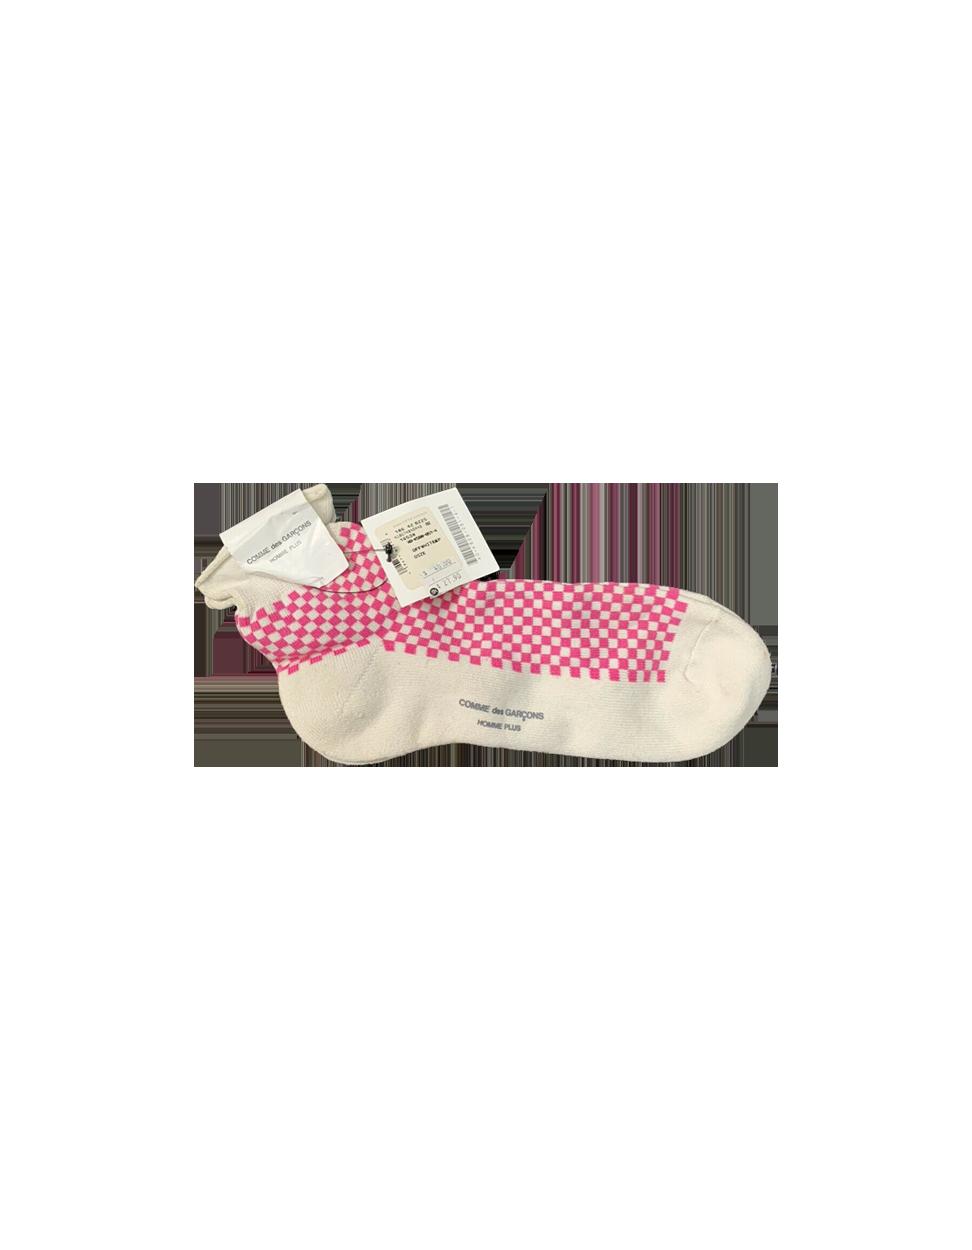 Vintage Comme Des Garcons Homme Plus Socks Checkered Pink